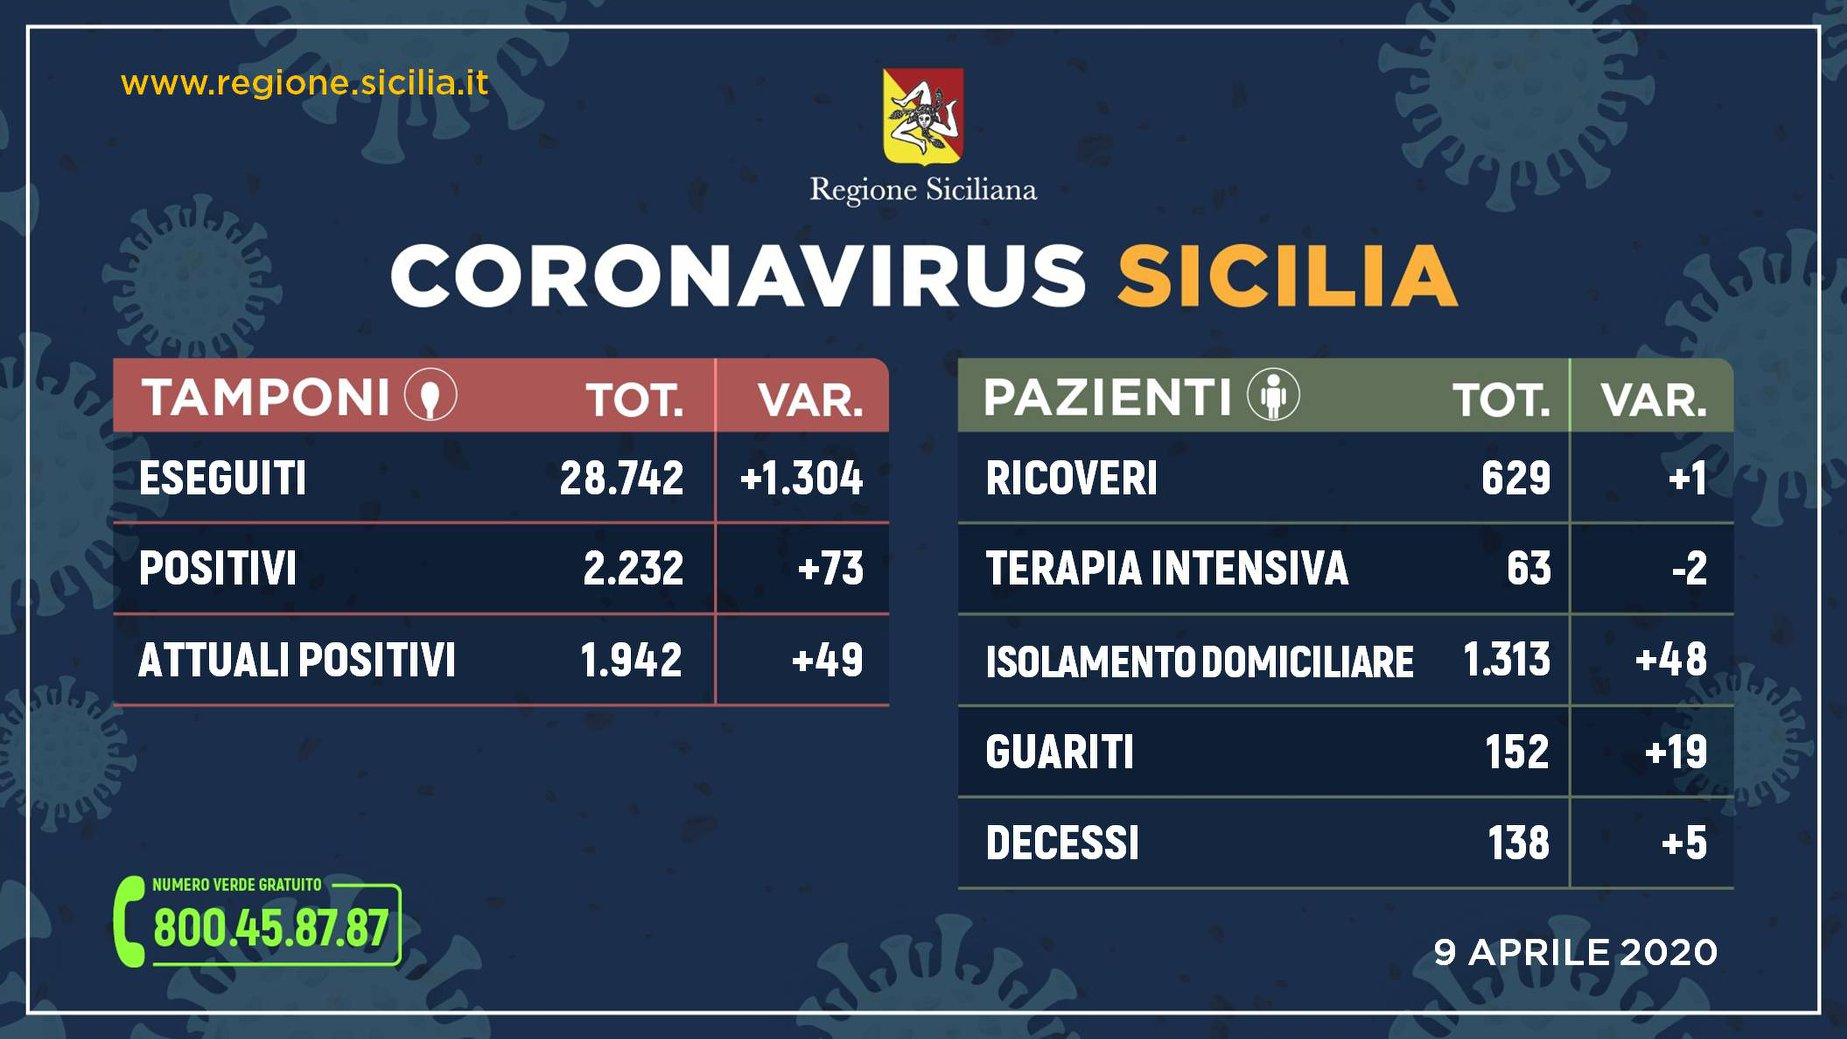 Coronavirus in Sicilia - 9 aprile 2020.